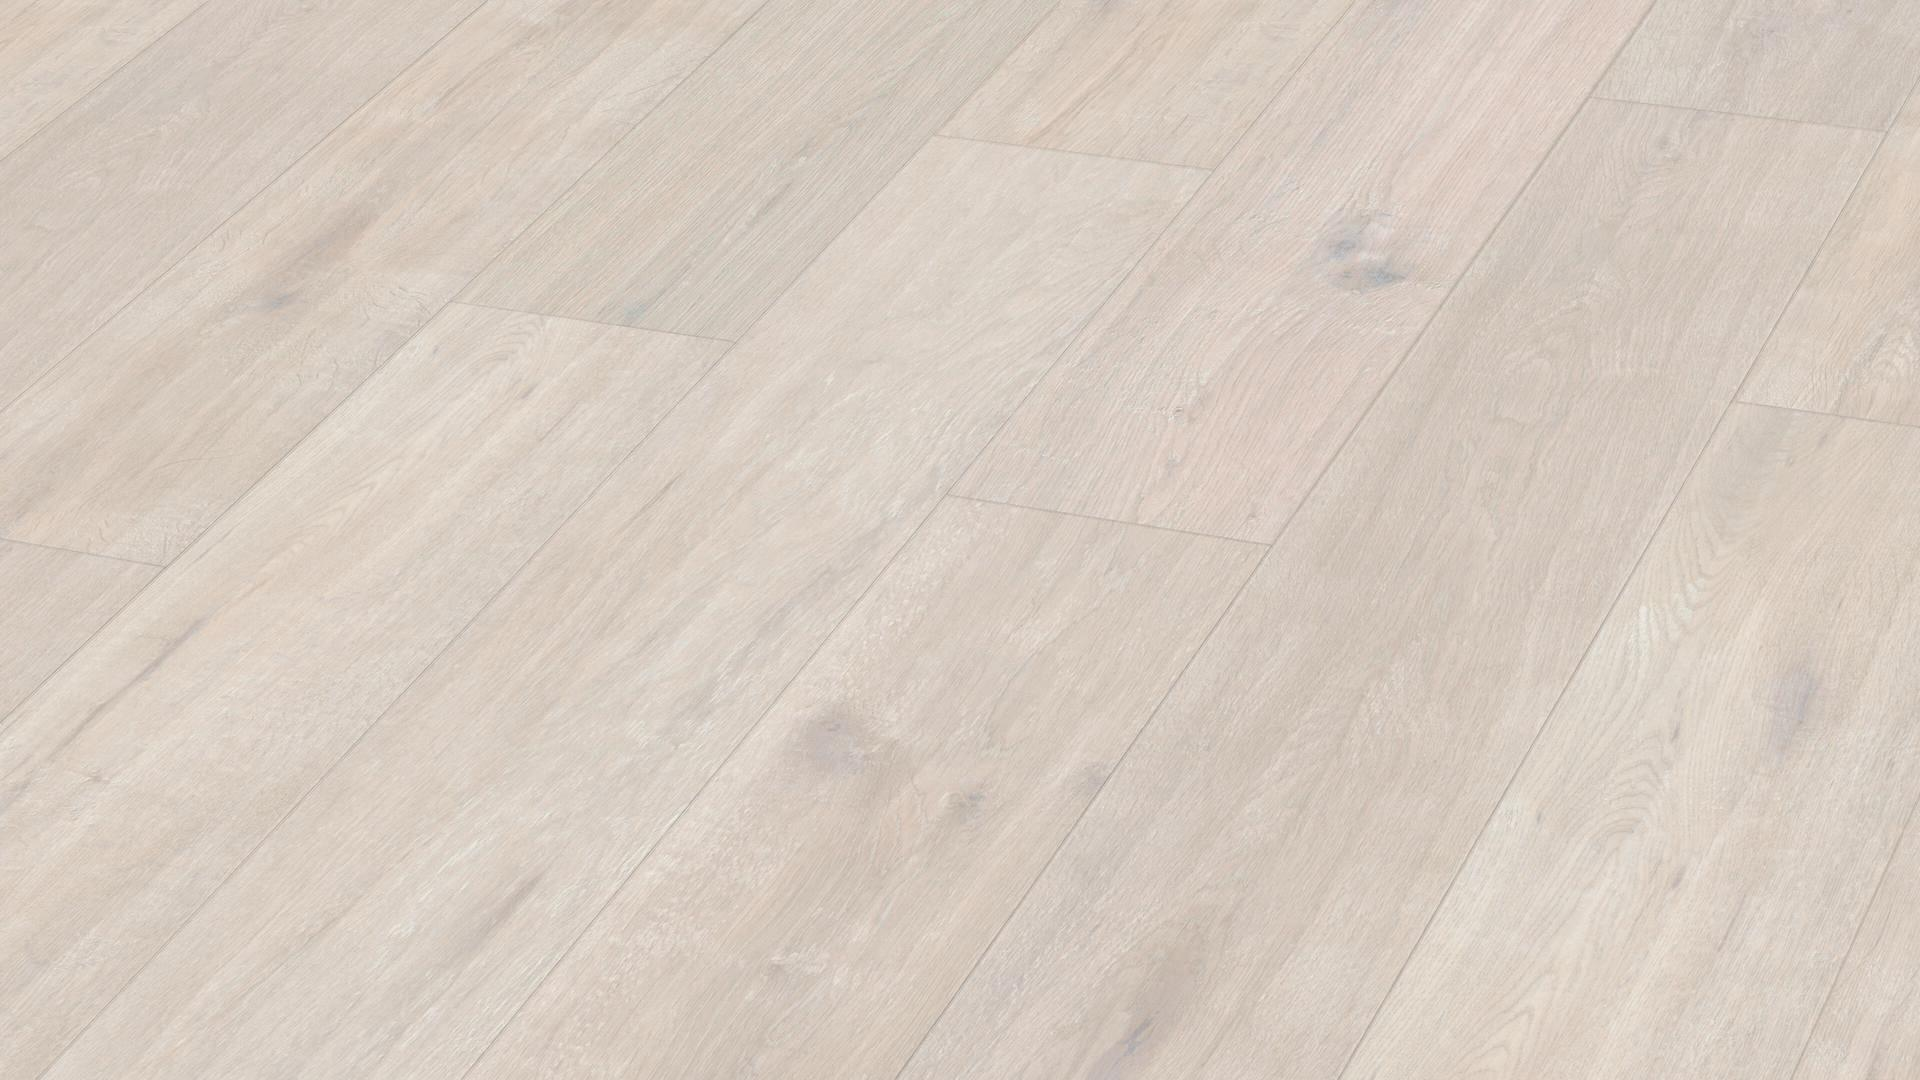 Suelo de diseño MeisterDesign. flex DL 400 Roble blanco ártico 6995